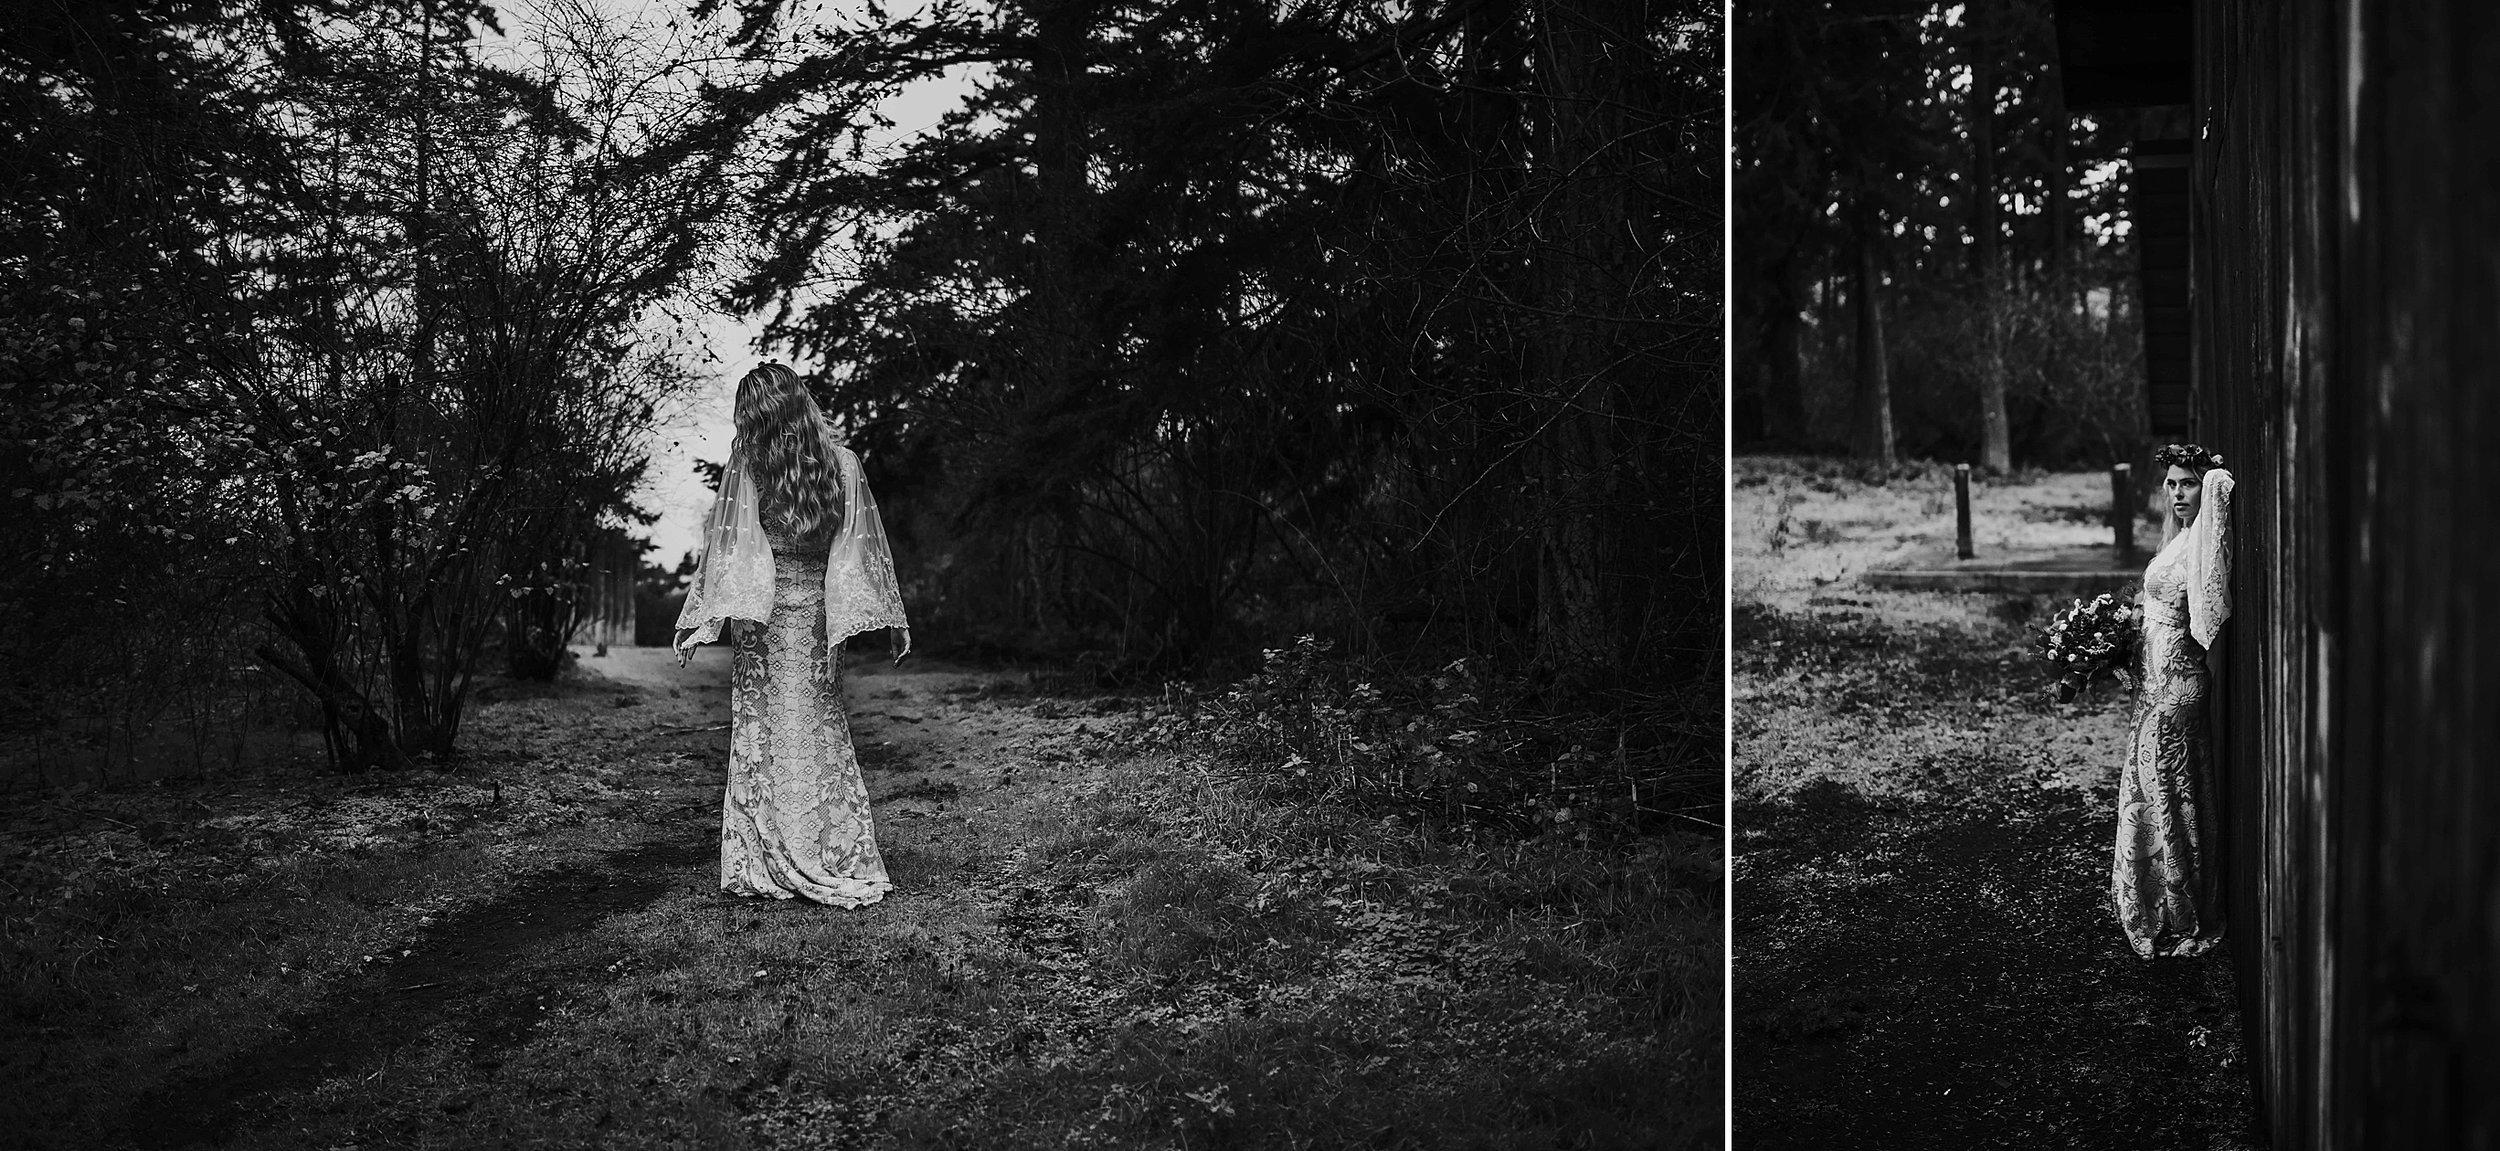 Wedding-photographer-J HODGES PHOTOGRAPHY_0230.jpg